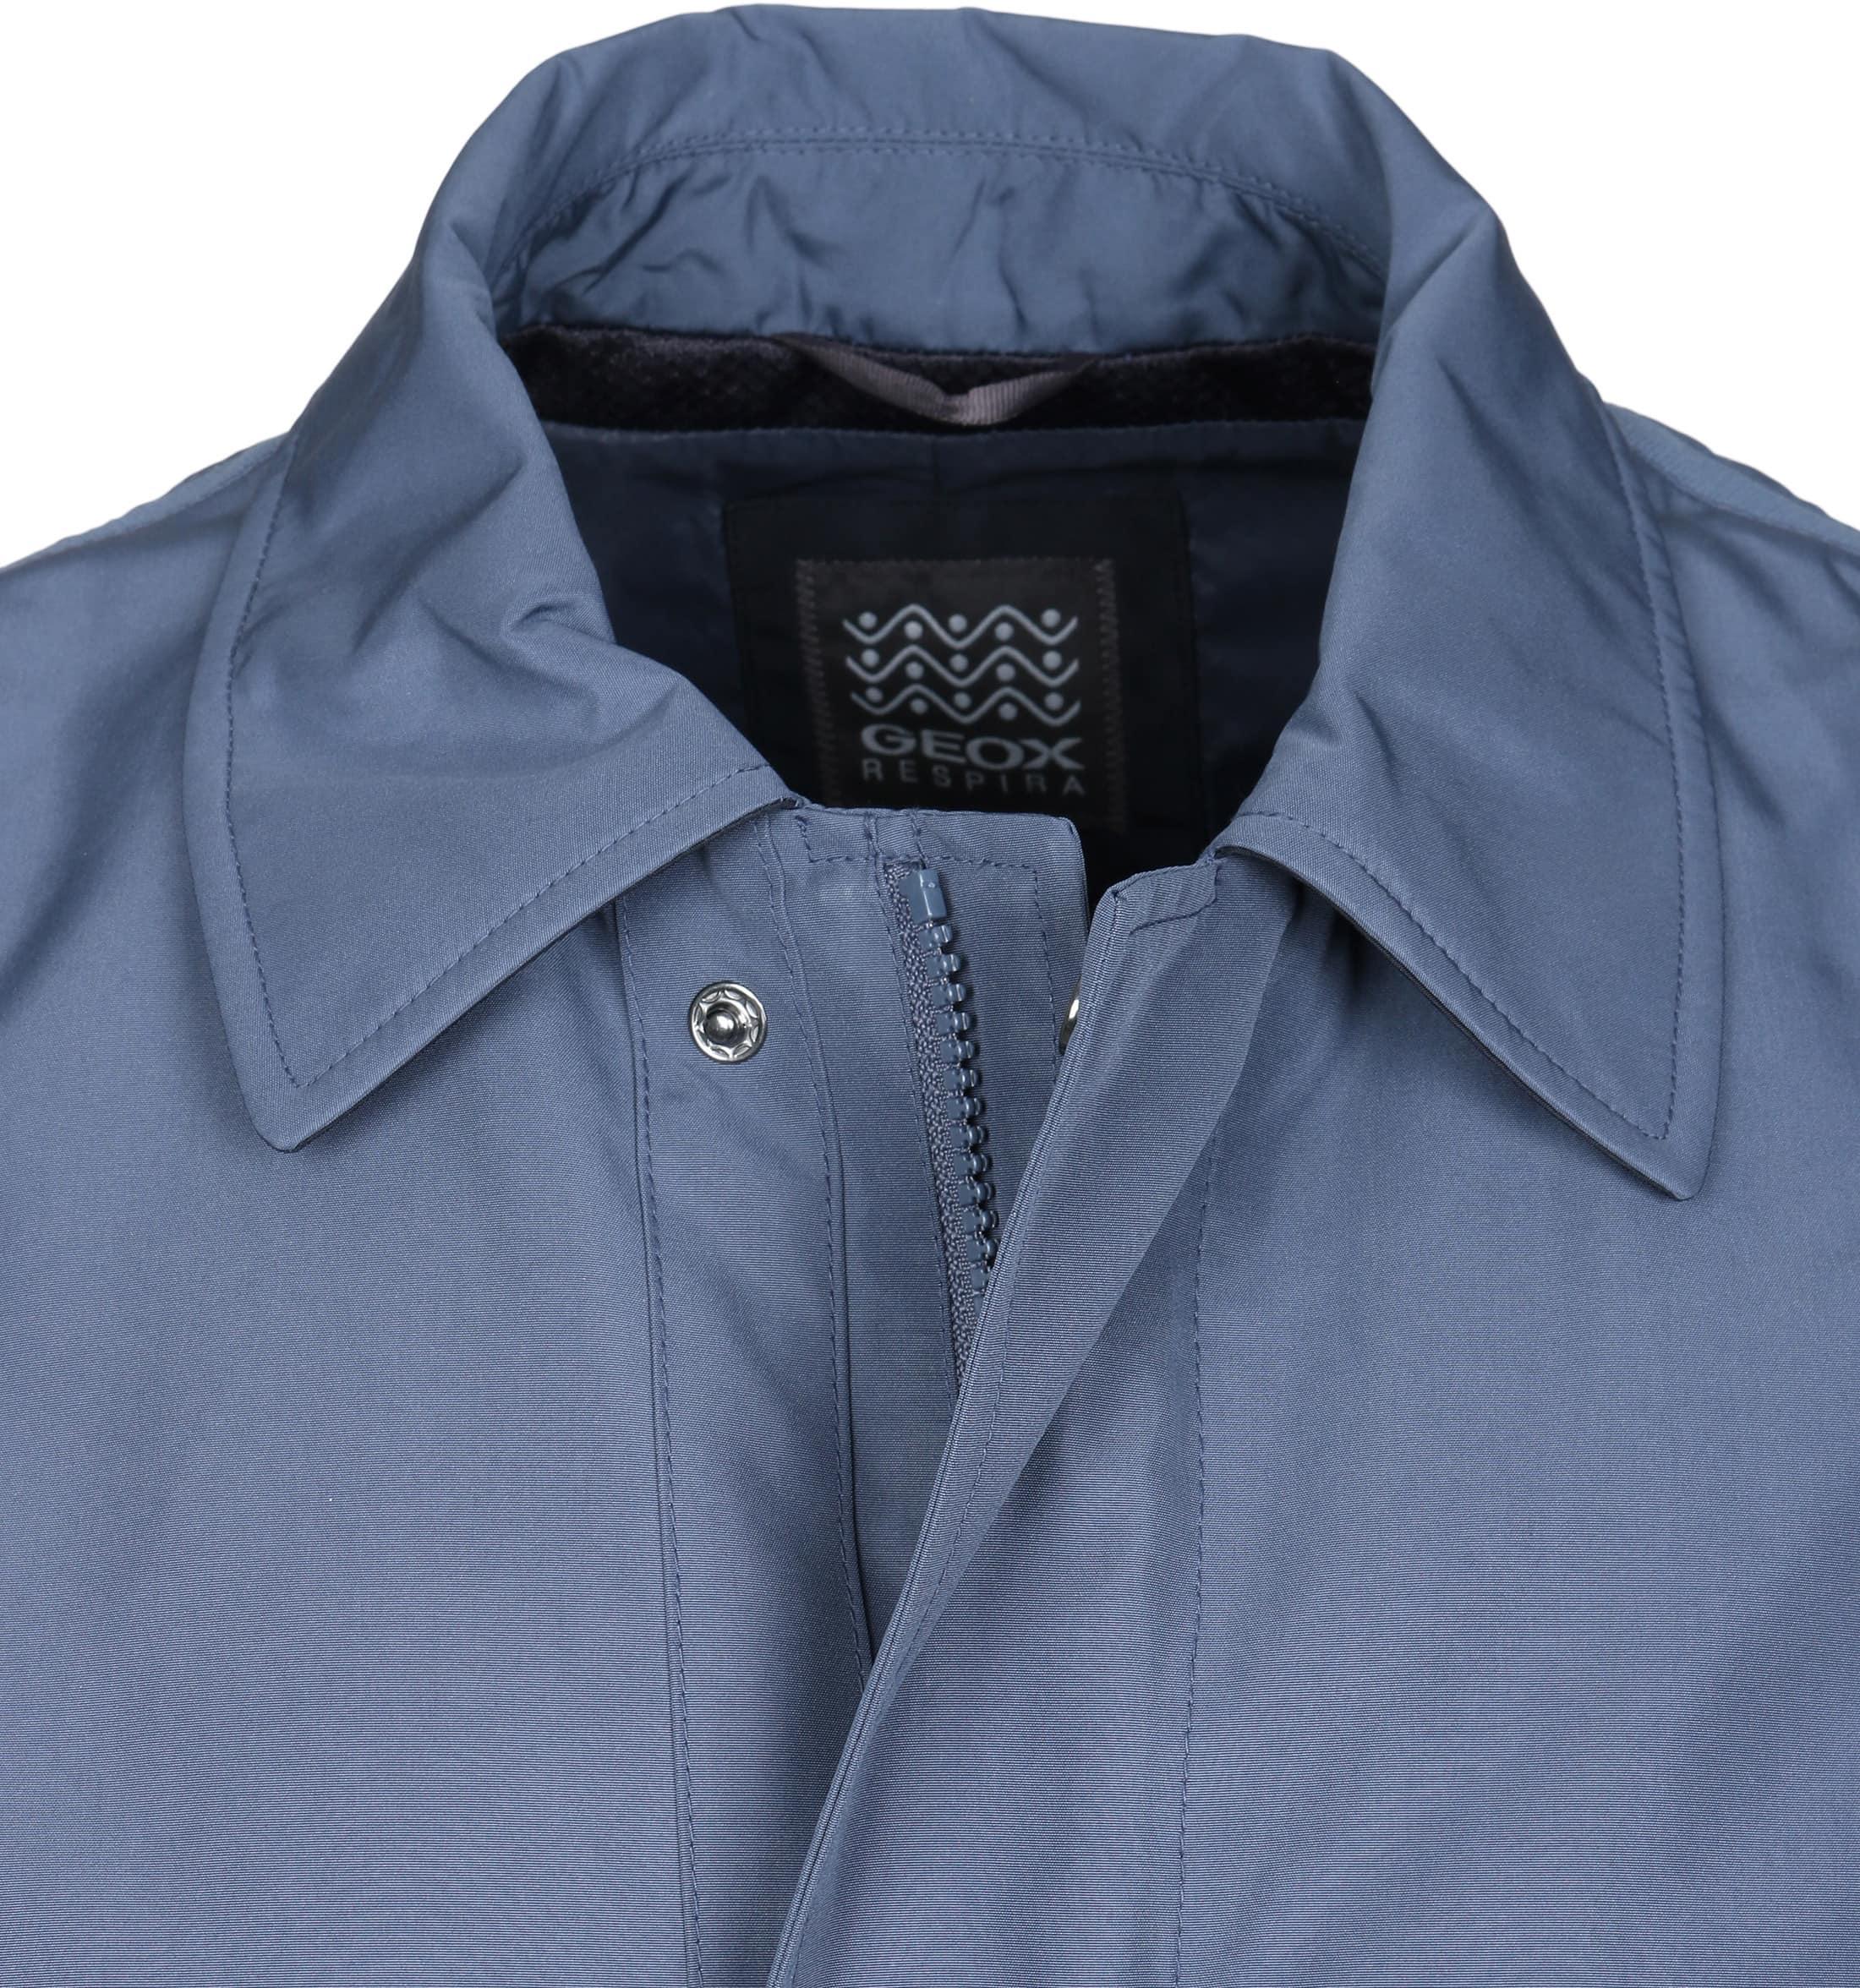 Geox Coat Vintage Indigo foto 1